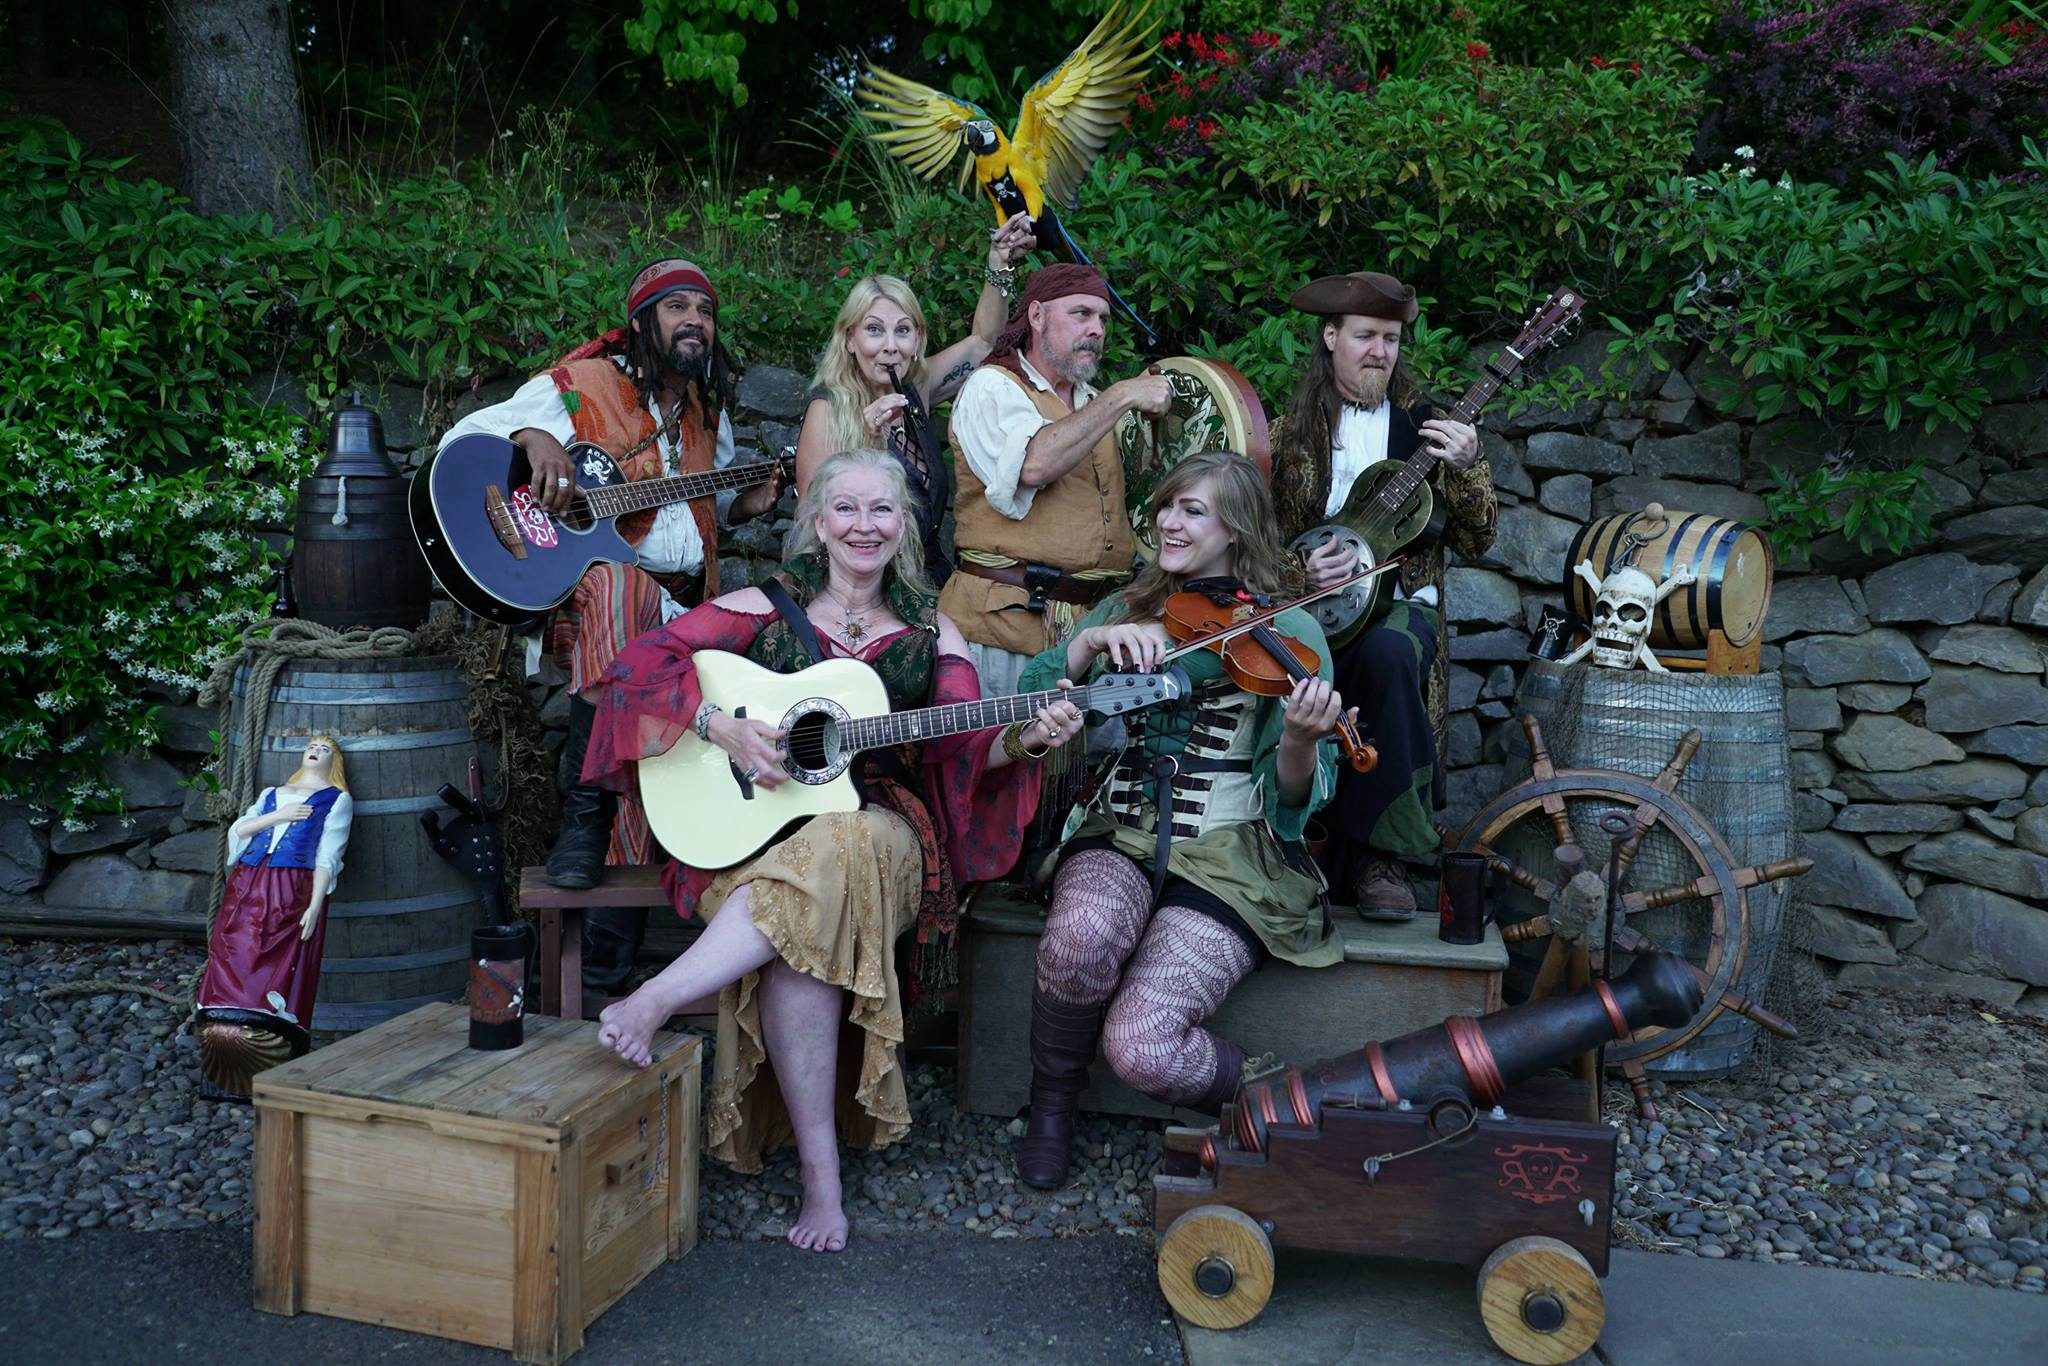 Bilgerats & Pyrettes (Pirate Band)